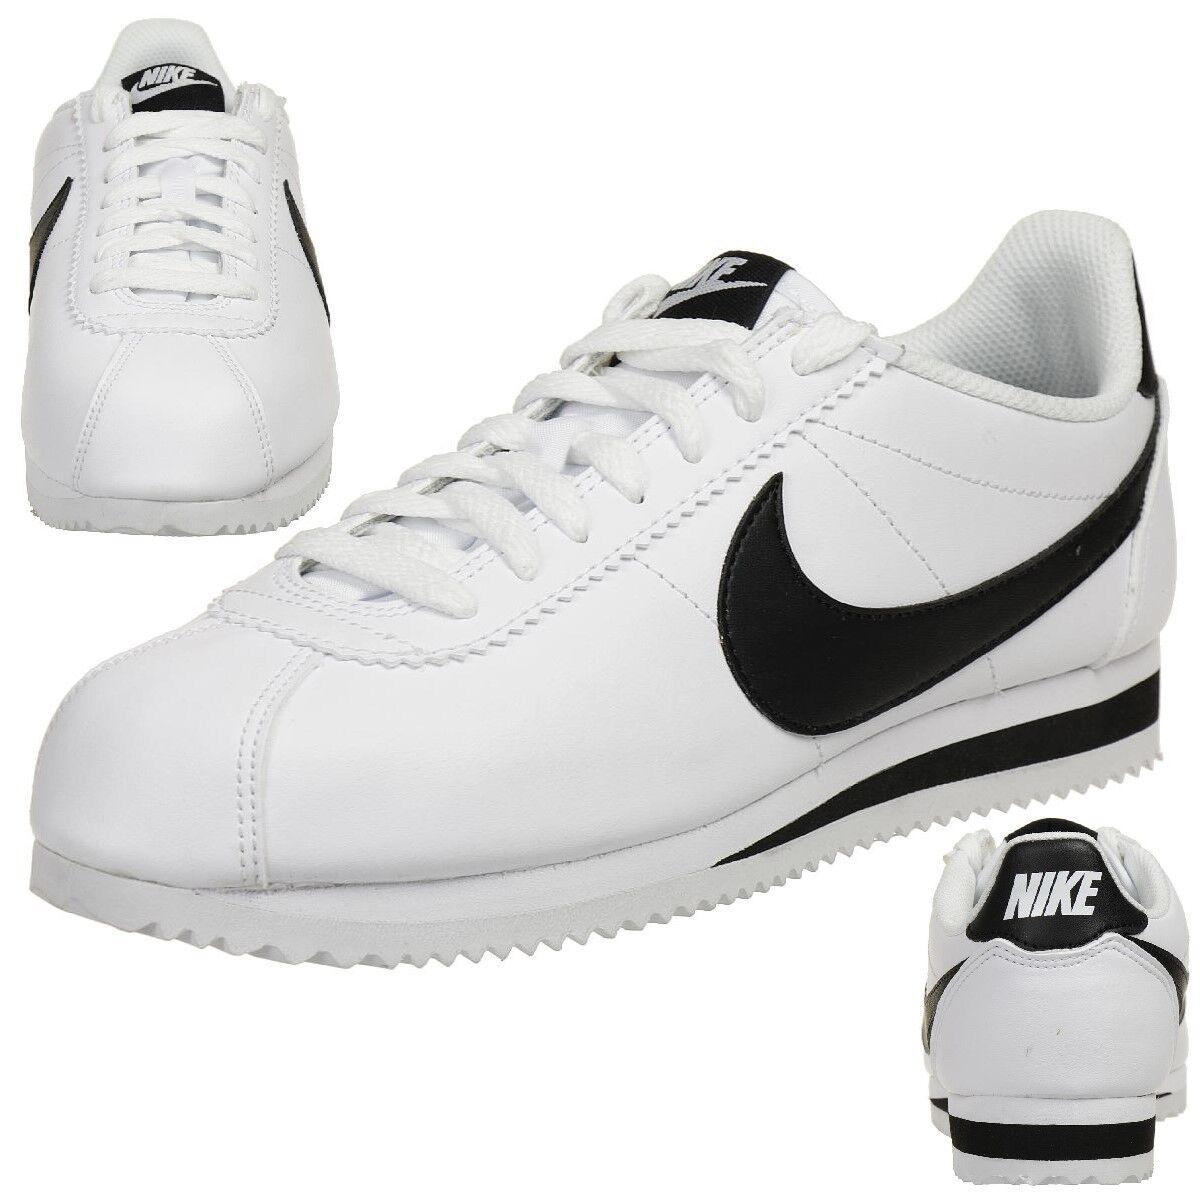 Nike Classic Cortez Cuir Baskets Femme Lifestyle Chaussures 807471 101